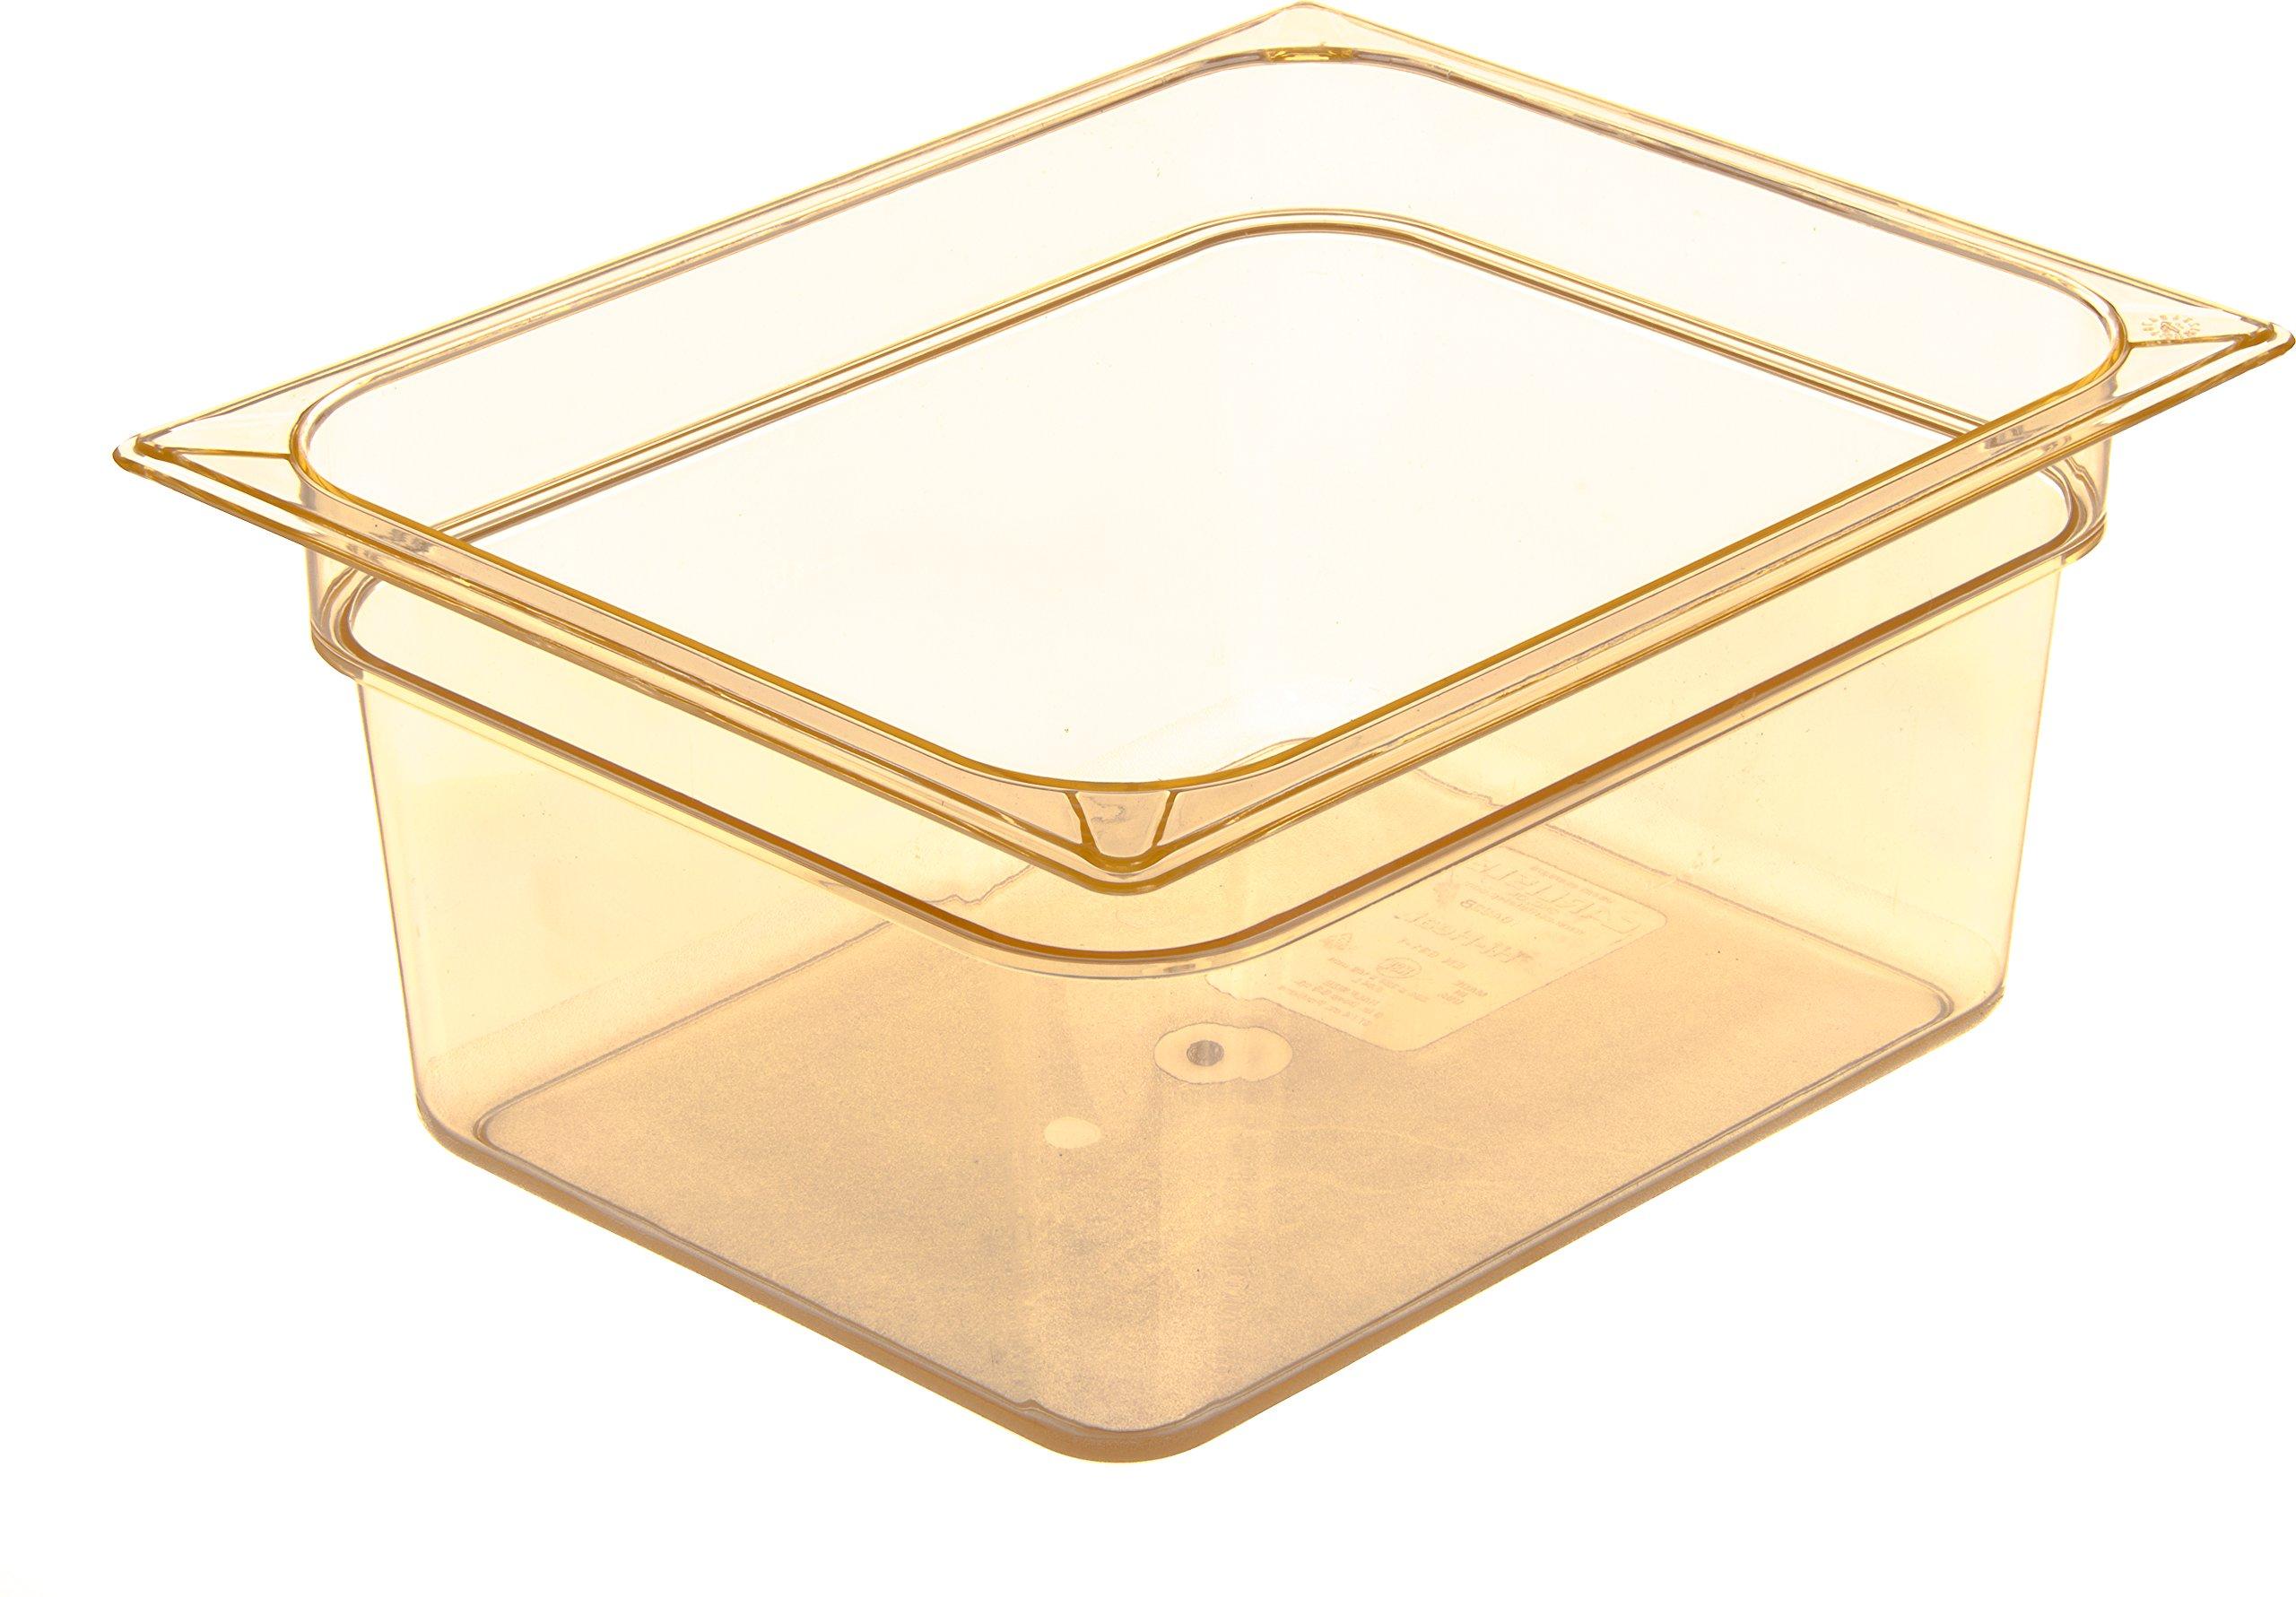 Carlisle 10422B13 High Heat One-Half Size Food Pan, 8.7-quart Capacity, 6'' x 10.38'' x 12.75'', Amber (Case of 6)